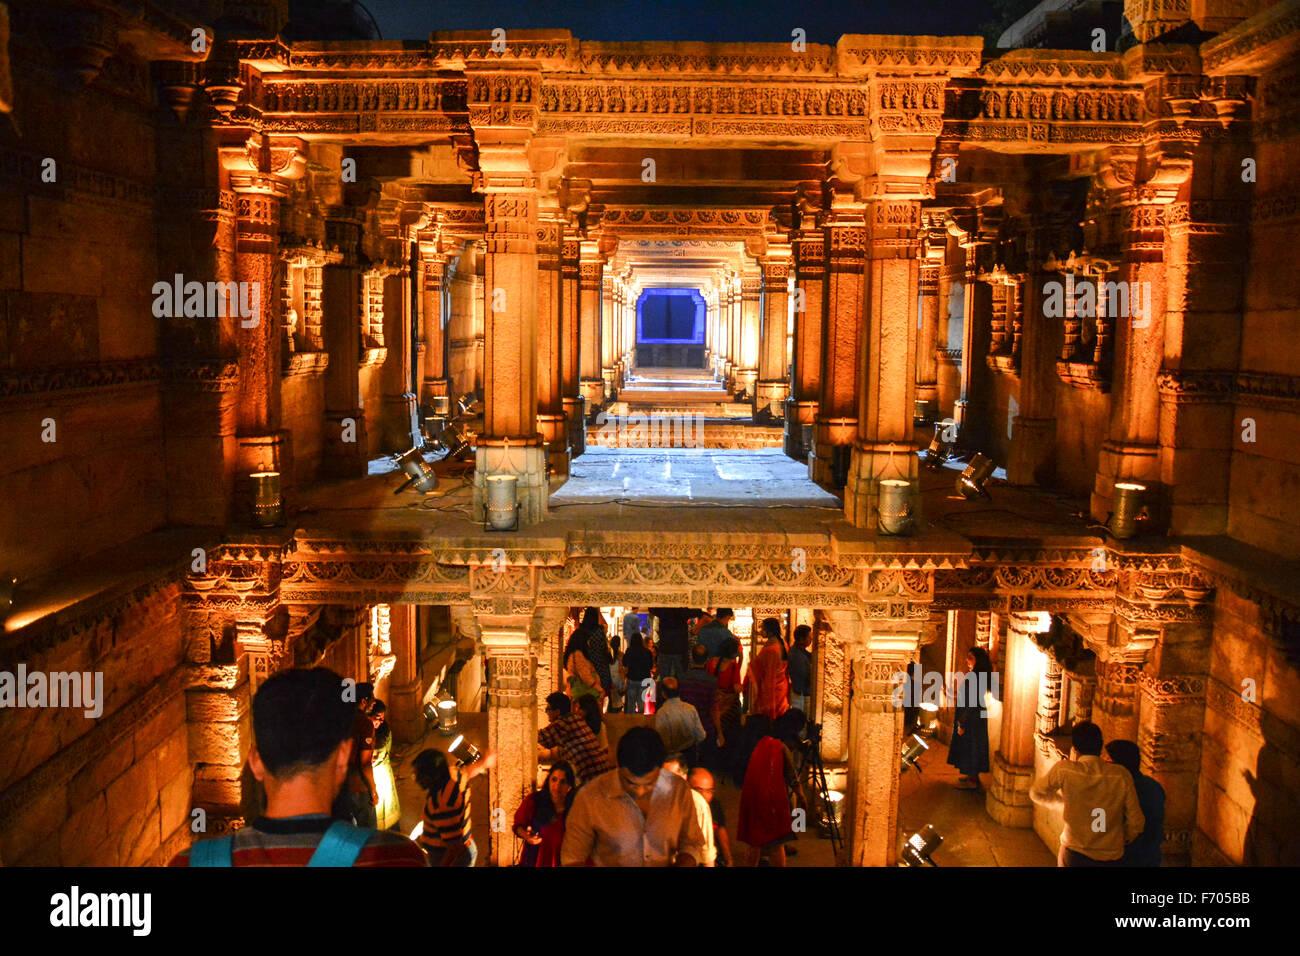 Ahmedabad, India. 21st Nov, 2015. The sounds of tabla, santoor and kartal melted effortlessly with keyboard, guitar - Stock Image